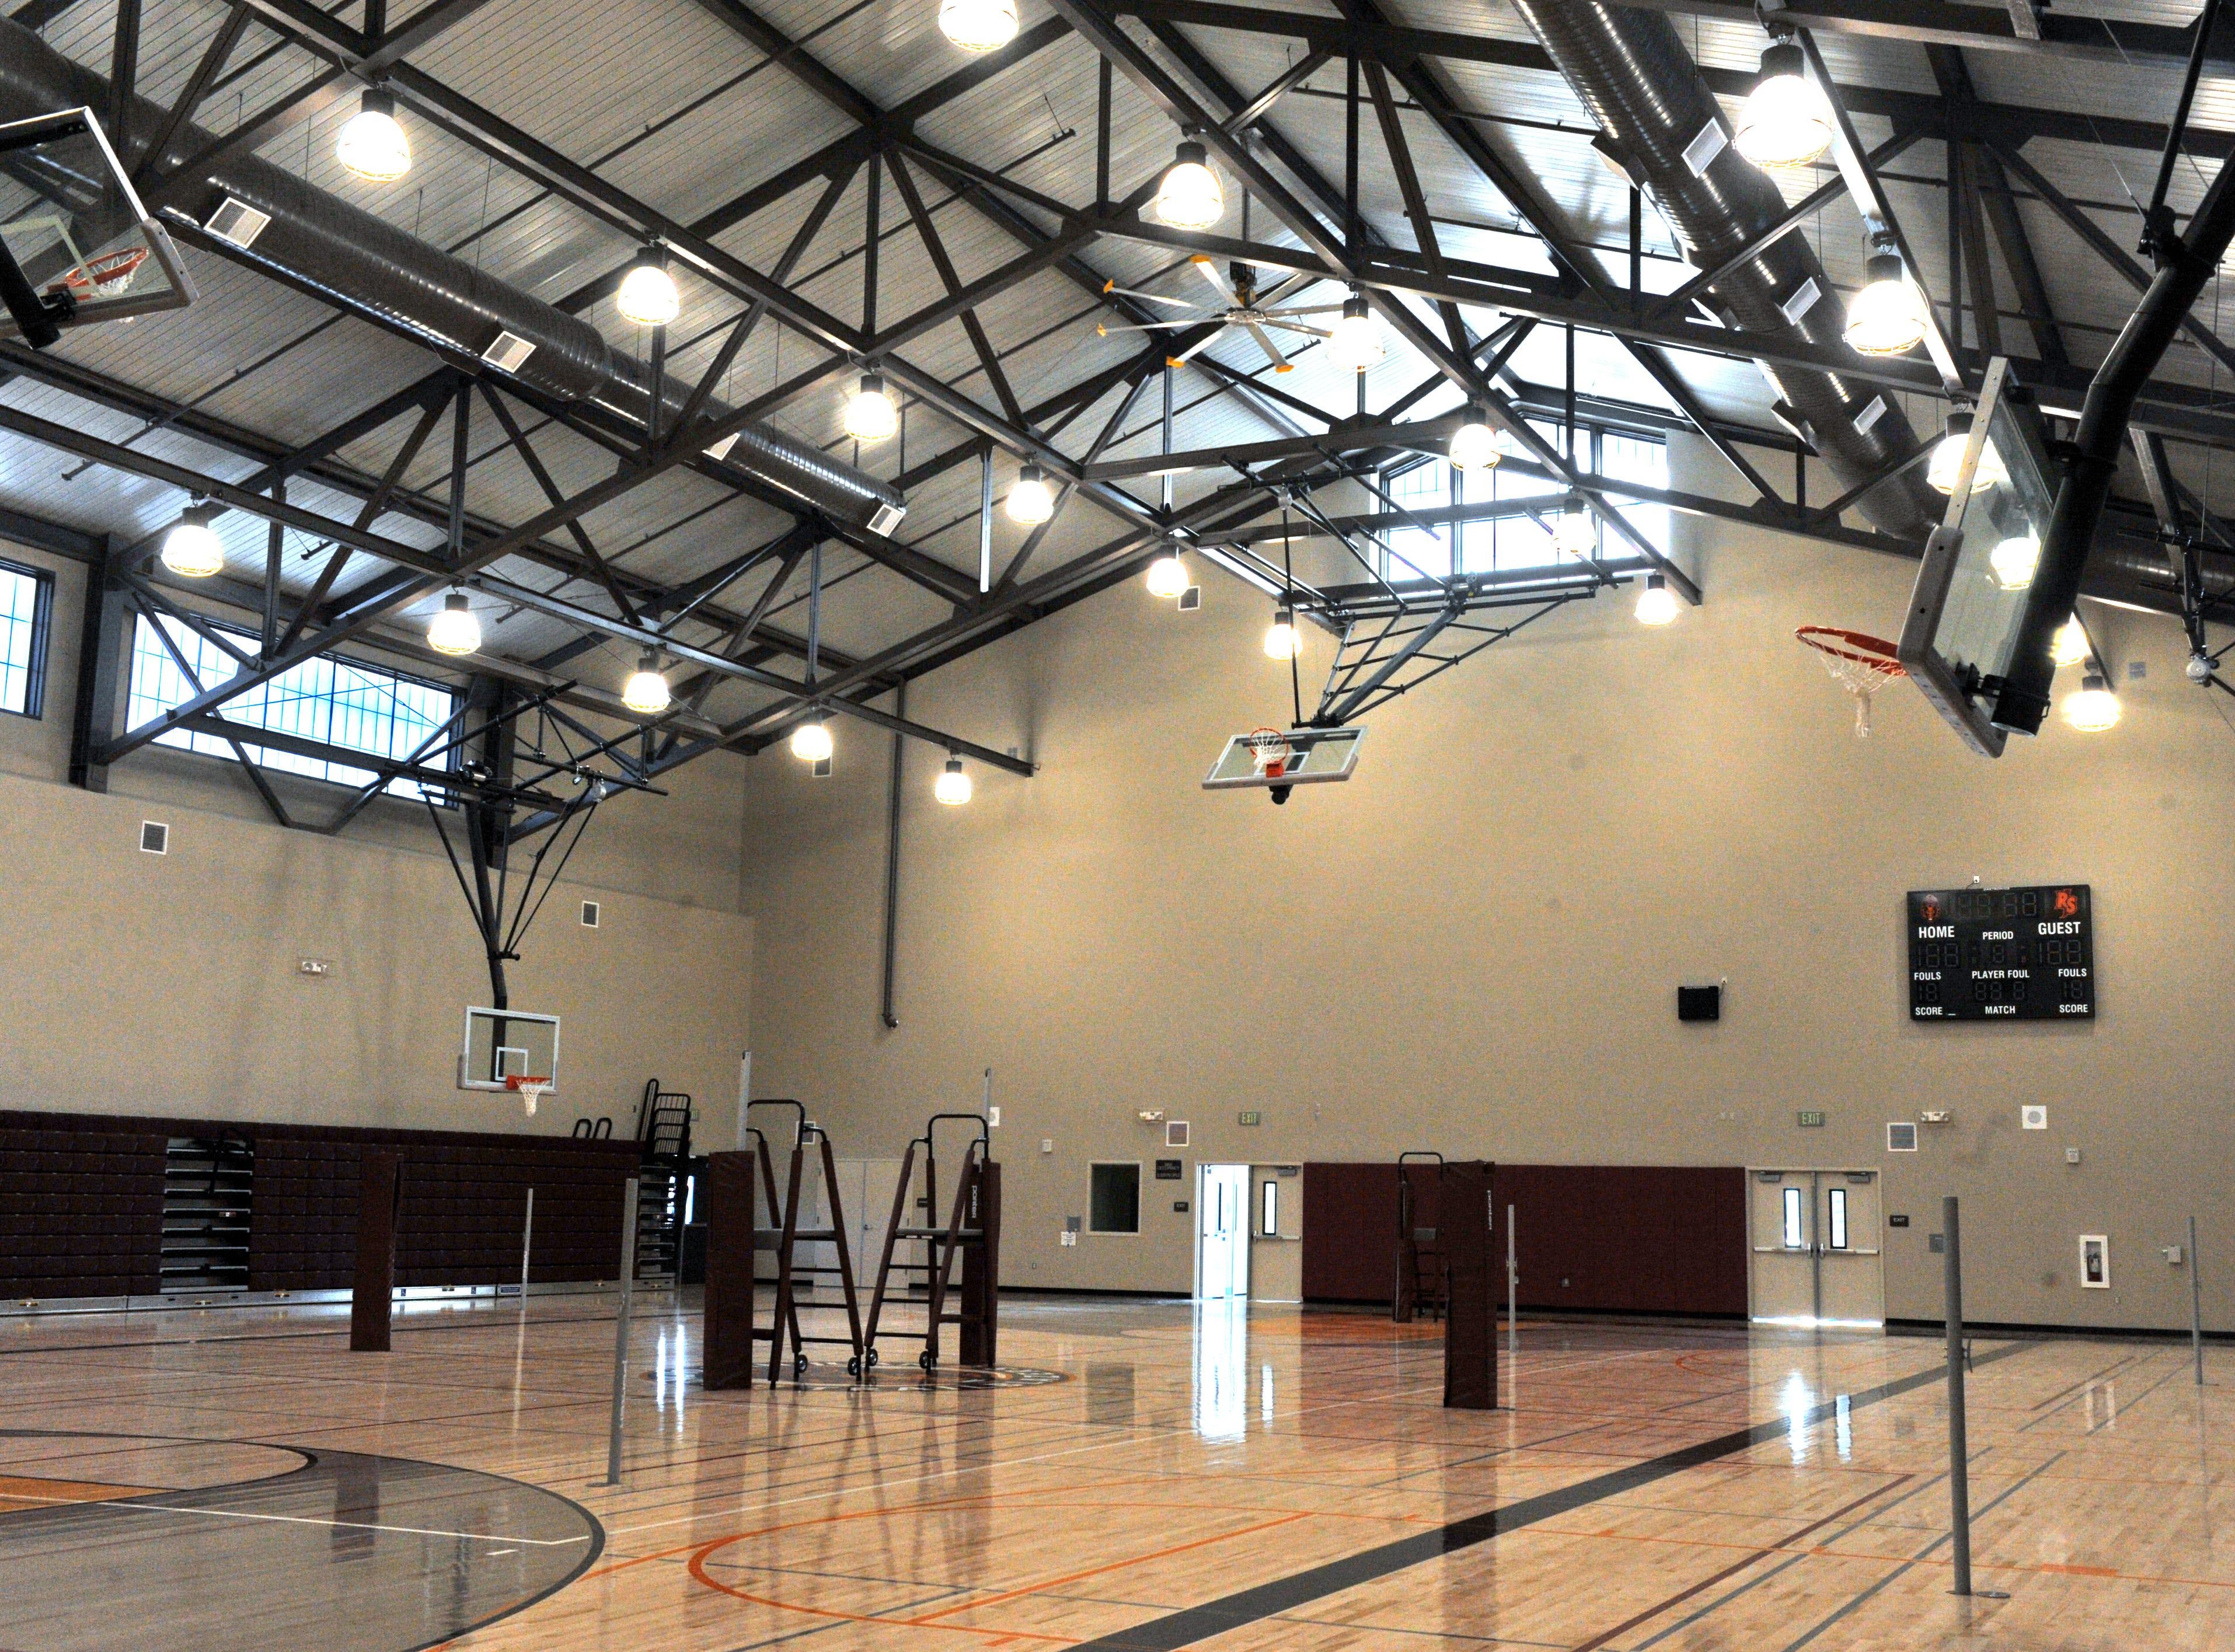 Inside the main gym for Rancho San Juan High School.